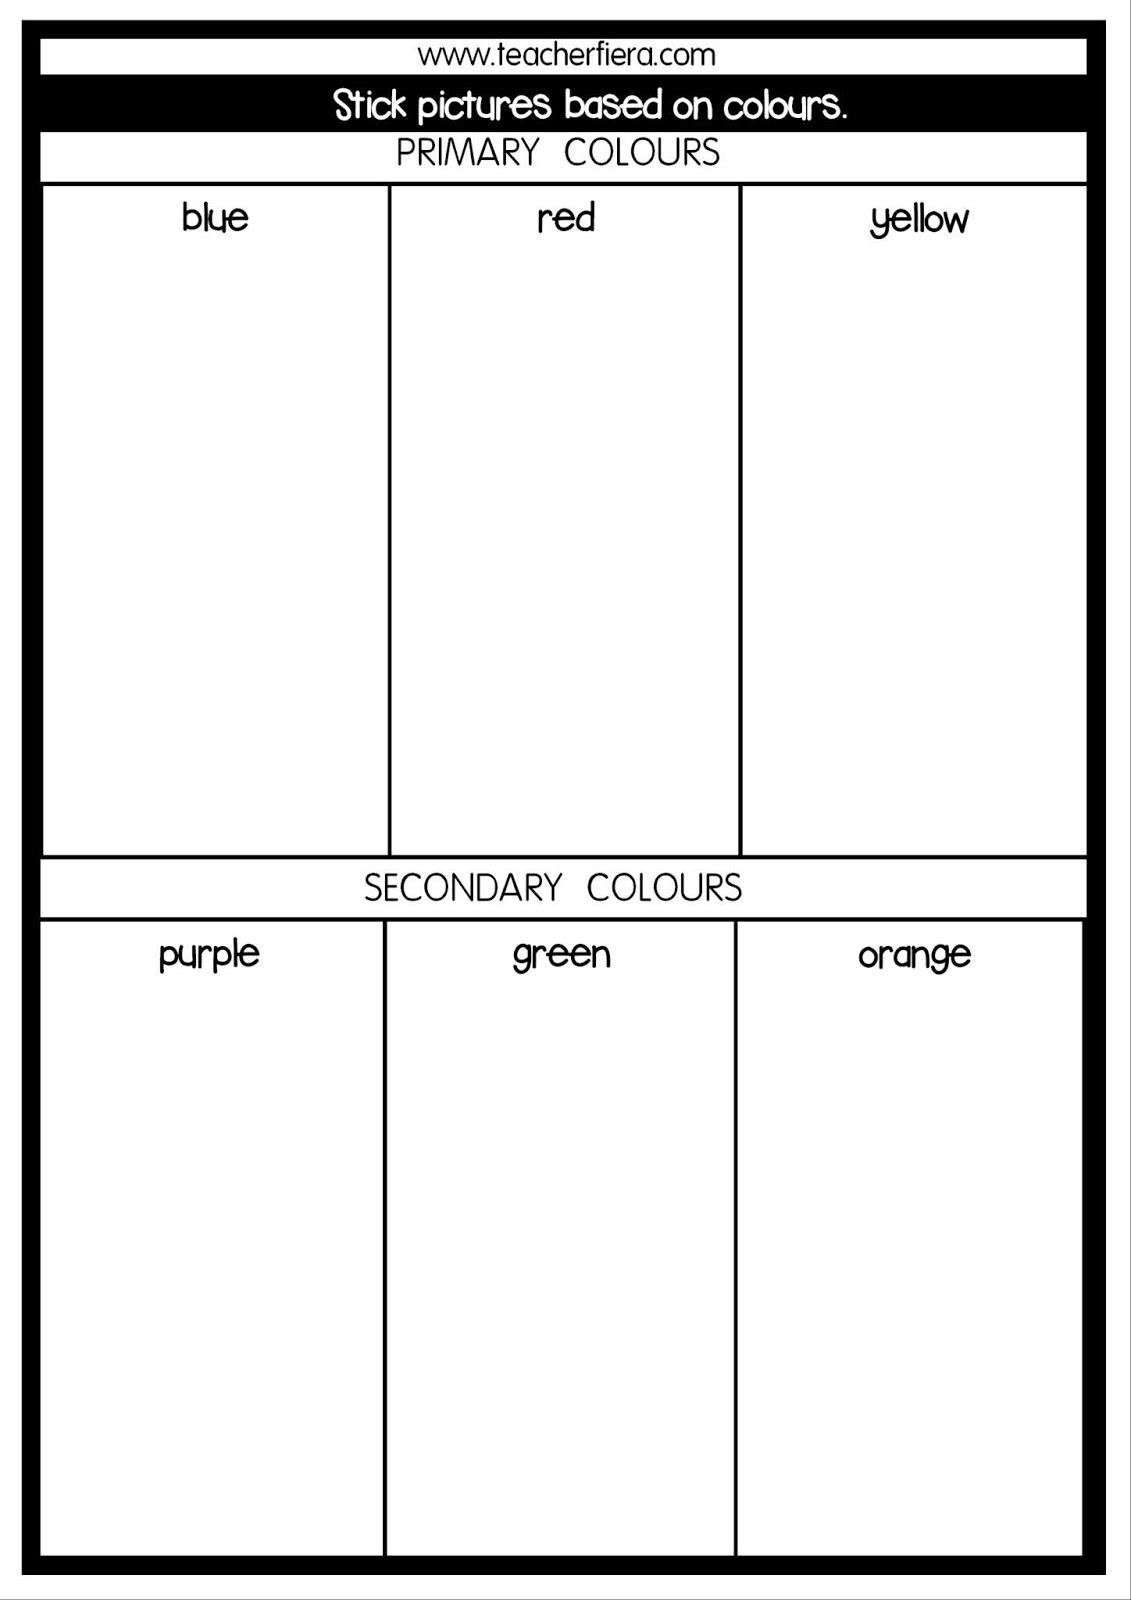 Teacherfiera Year 1 Unit 1 Colour Chart